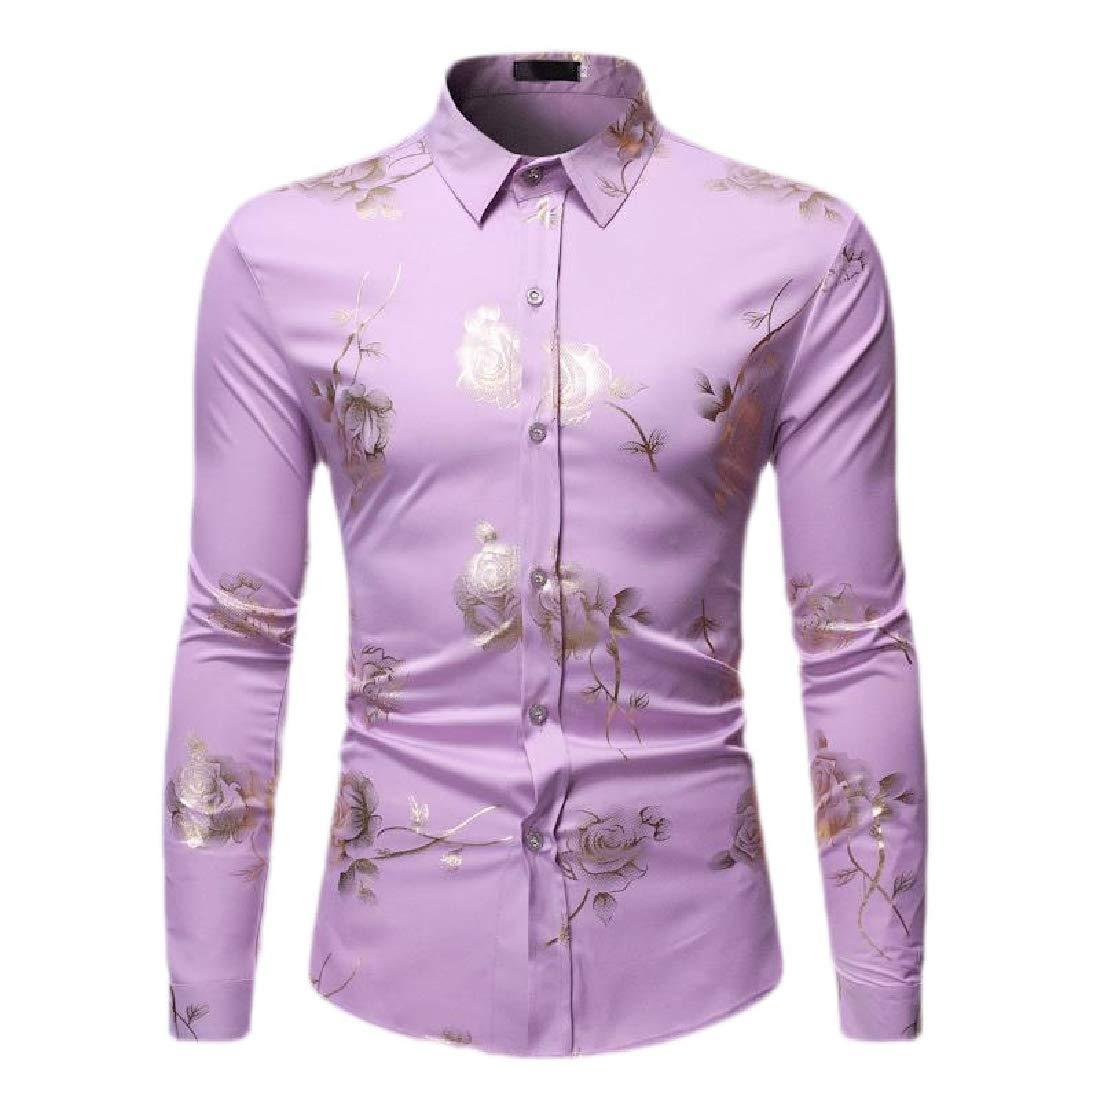 Jmwss QD Mens Floral Button Down Shirt Long Sleeve Aloha Hawaiian Printed Shirt